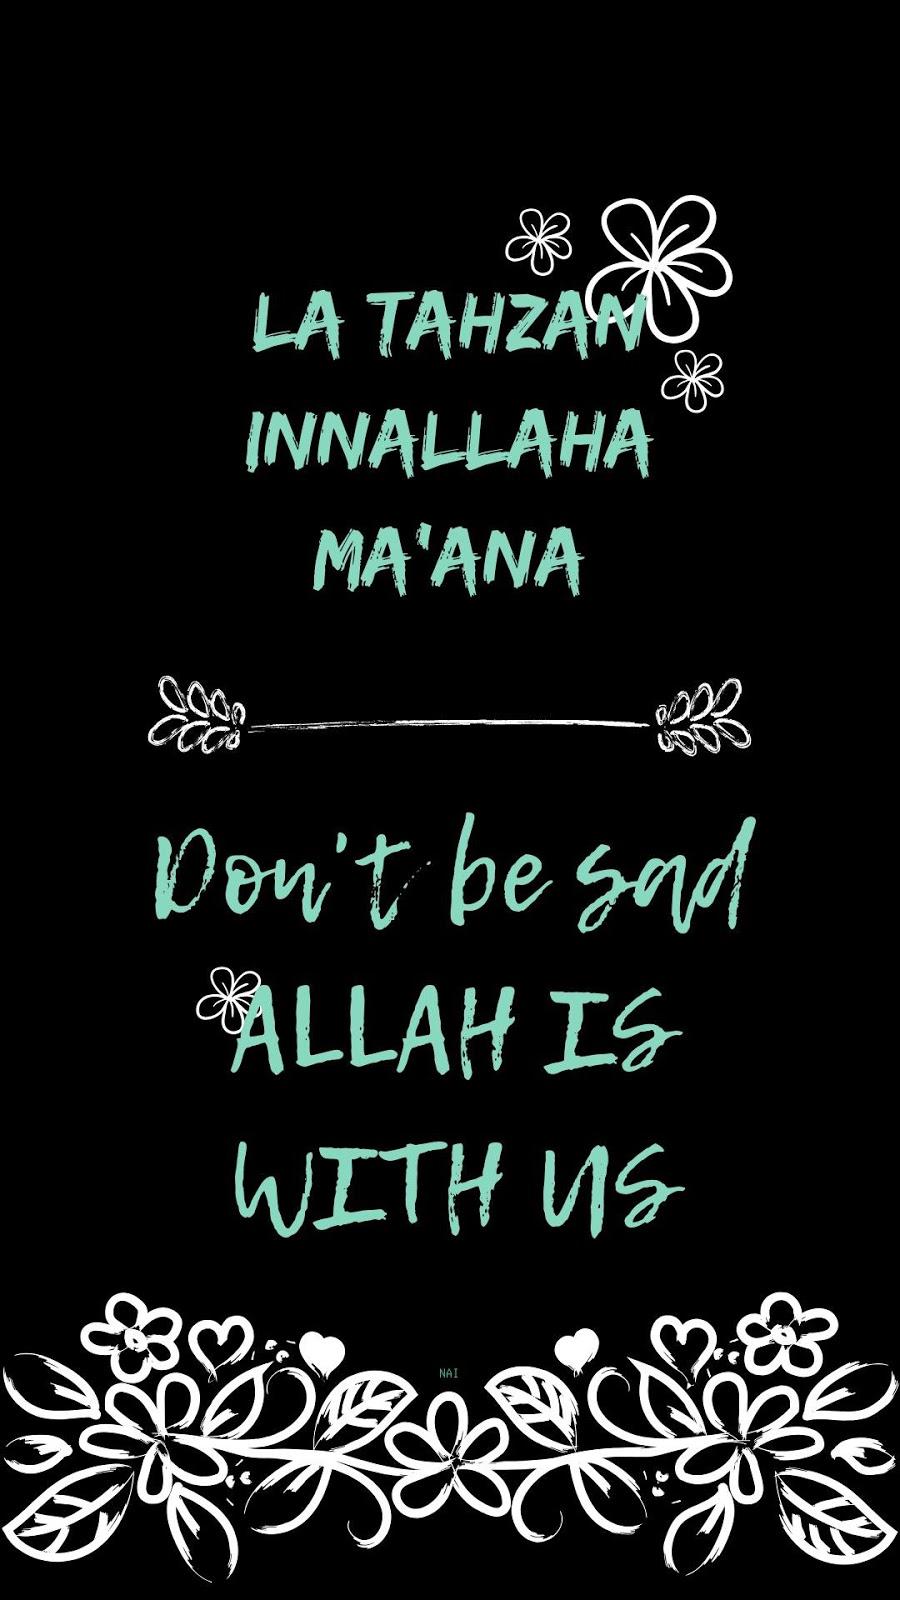 Wallpaper Ramadhan Keren Untuk HP Ukuran HD Jangan sedih dan